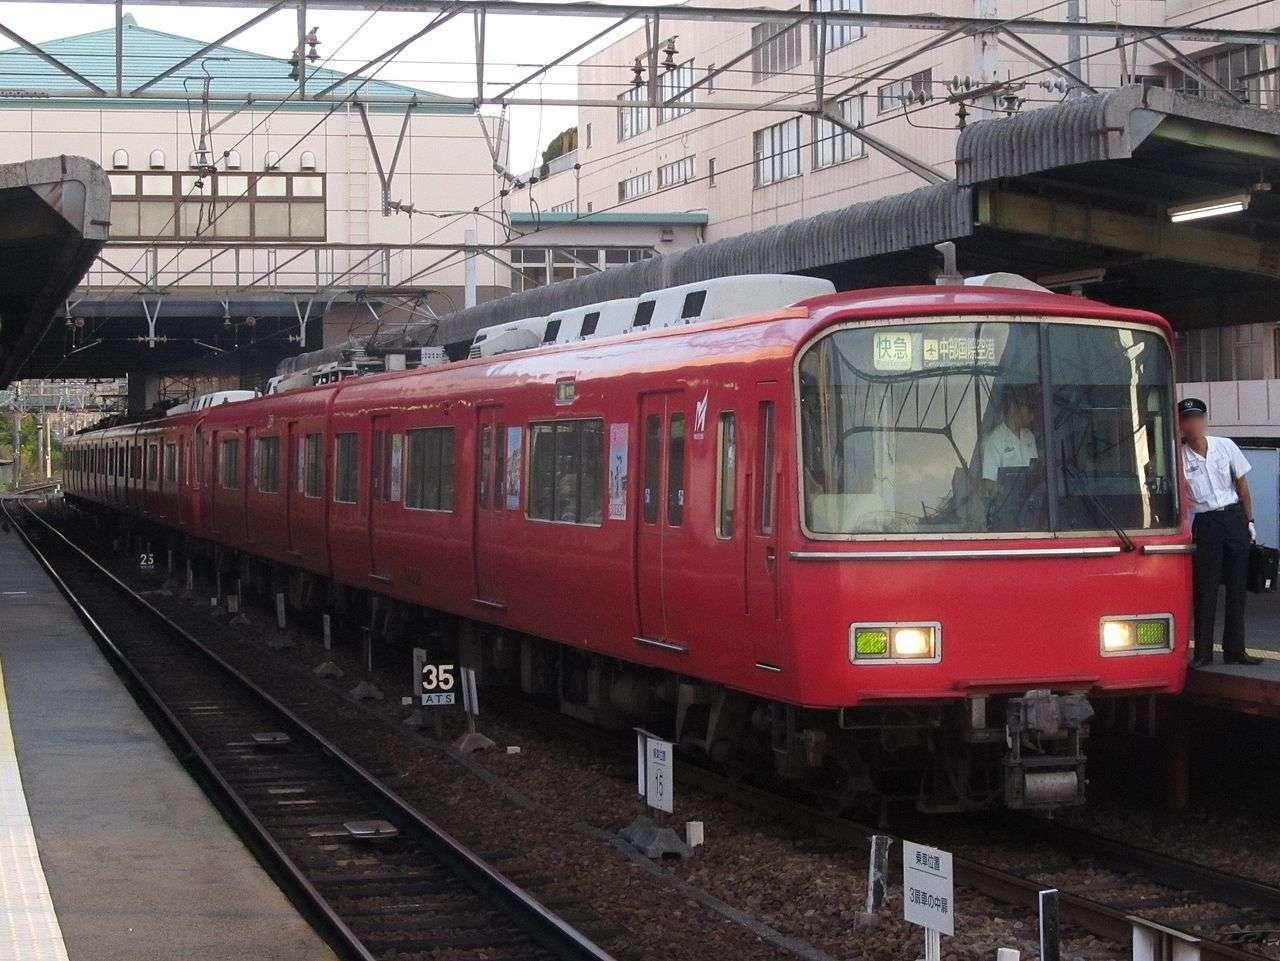 Pria tersebut memotong rambut korbannya di dalam kereta ekspres Meitetsu   Sumber: wikimedia